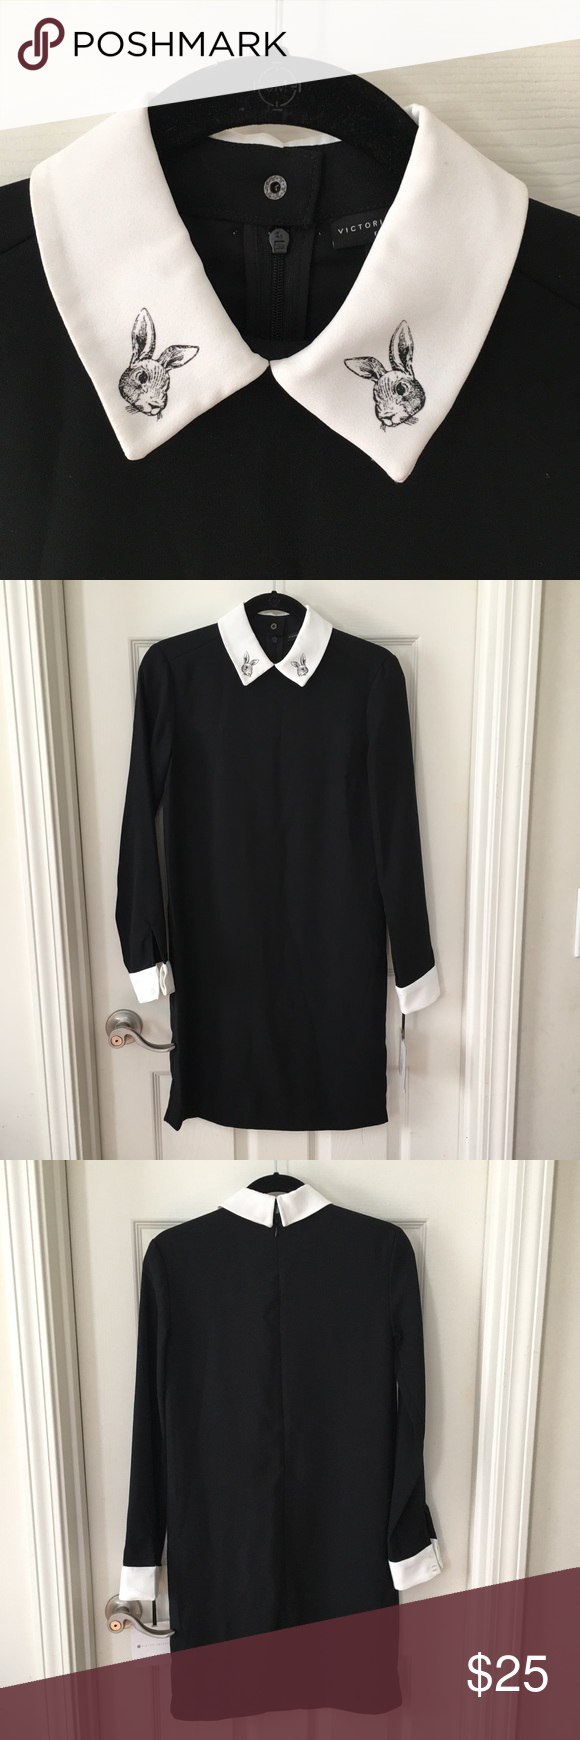 Black Dress With Bunny Collar Black Long Sleeve Dress Black Dress Long Sleeve Dress [ 1740 x 580 Pixel ]